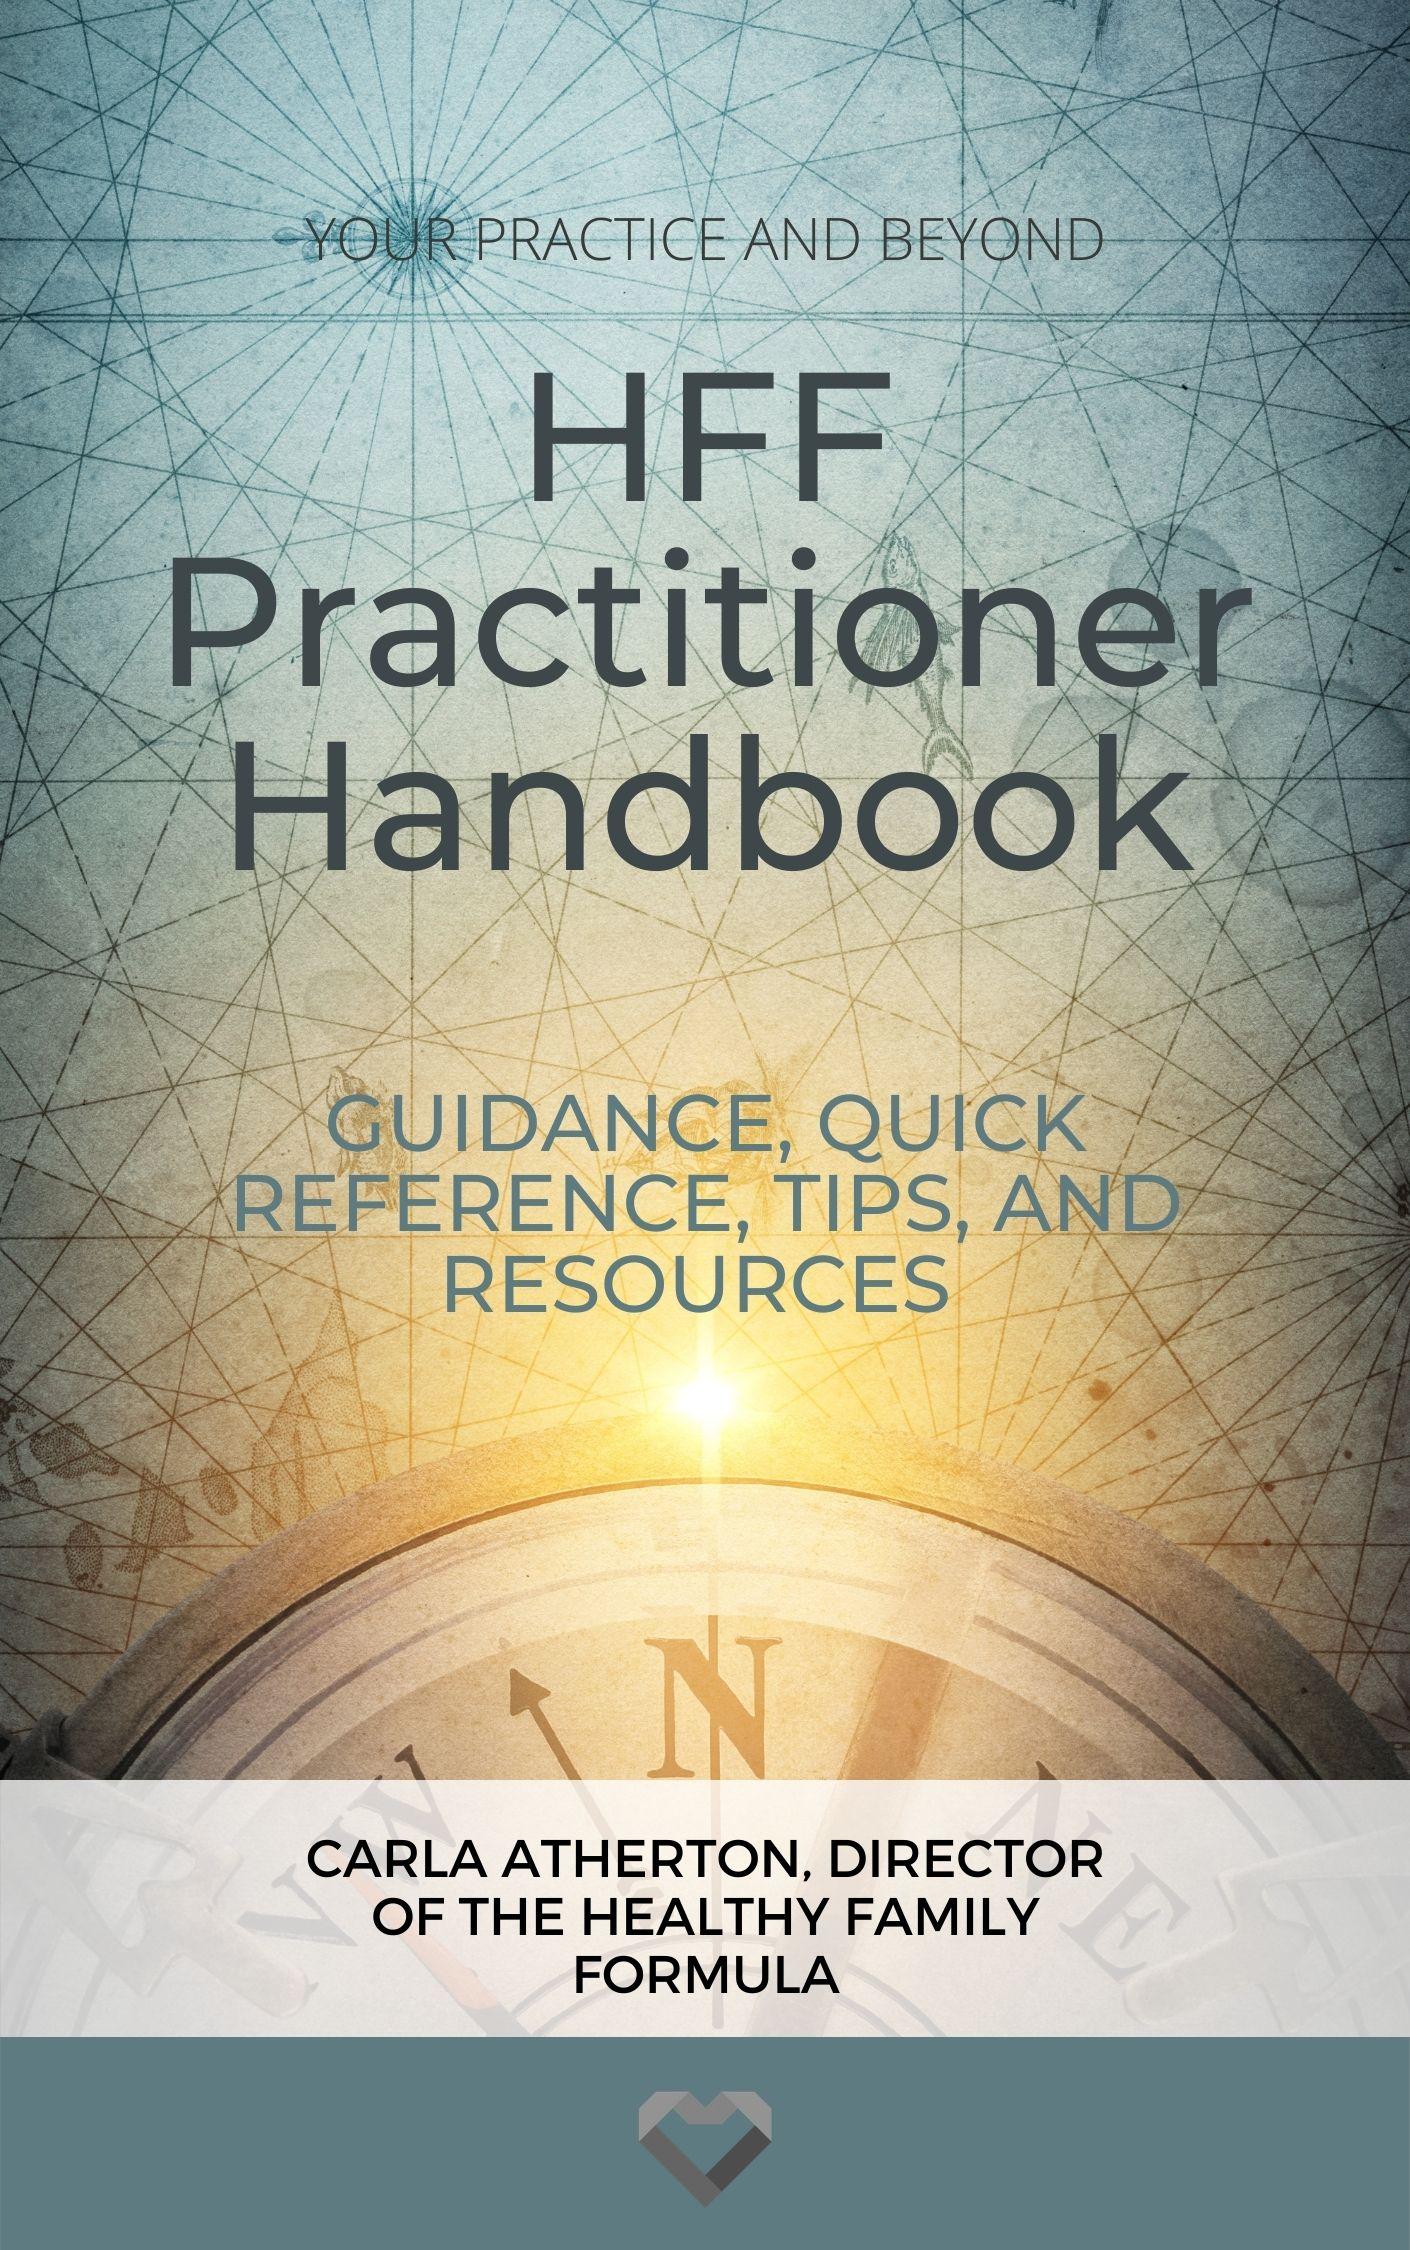 HFF Practitioner Handbook